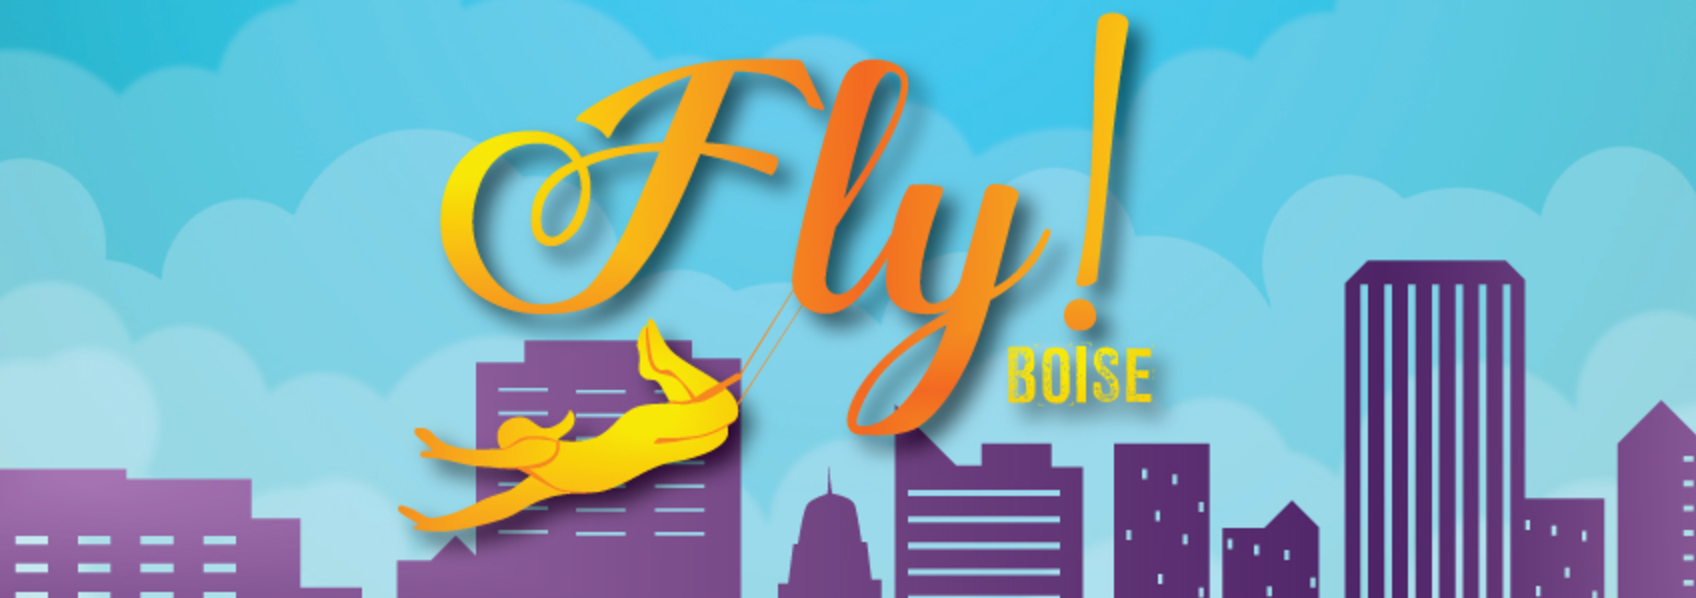 Fly! Boise